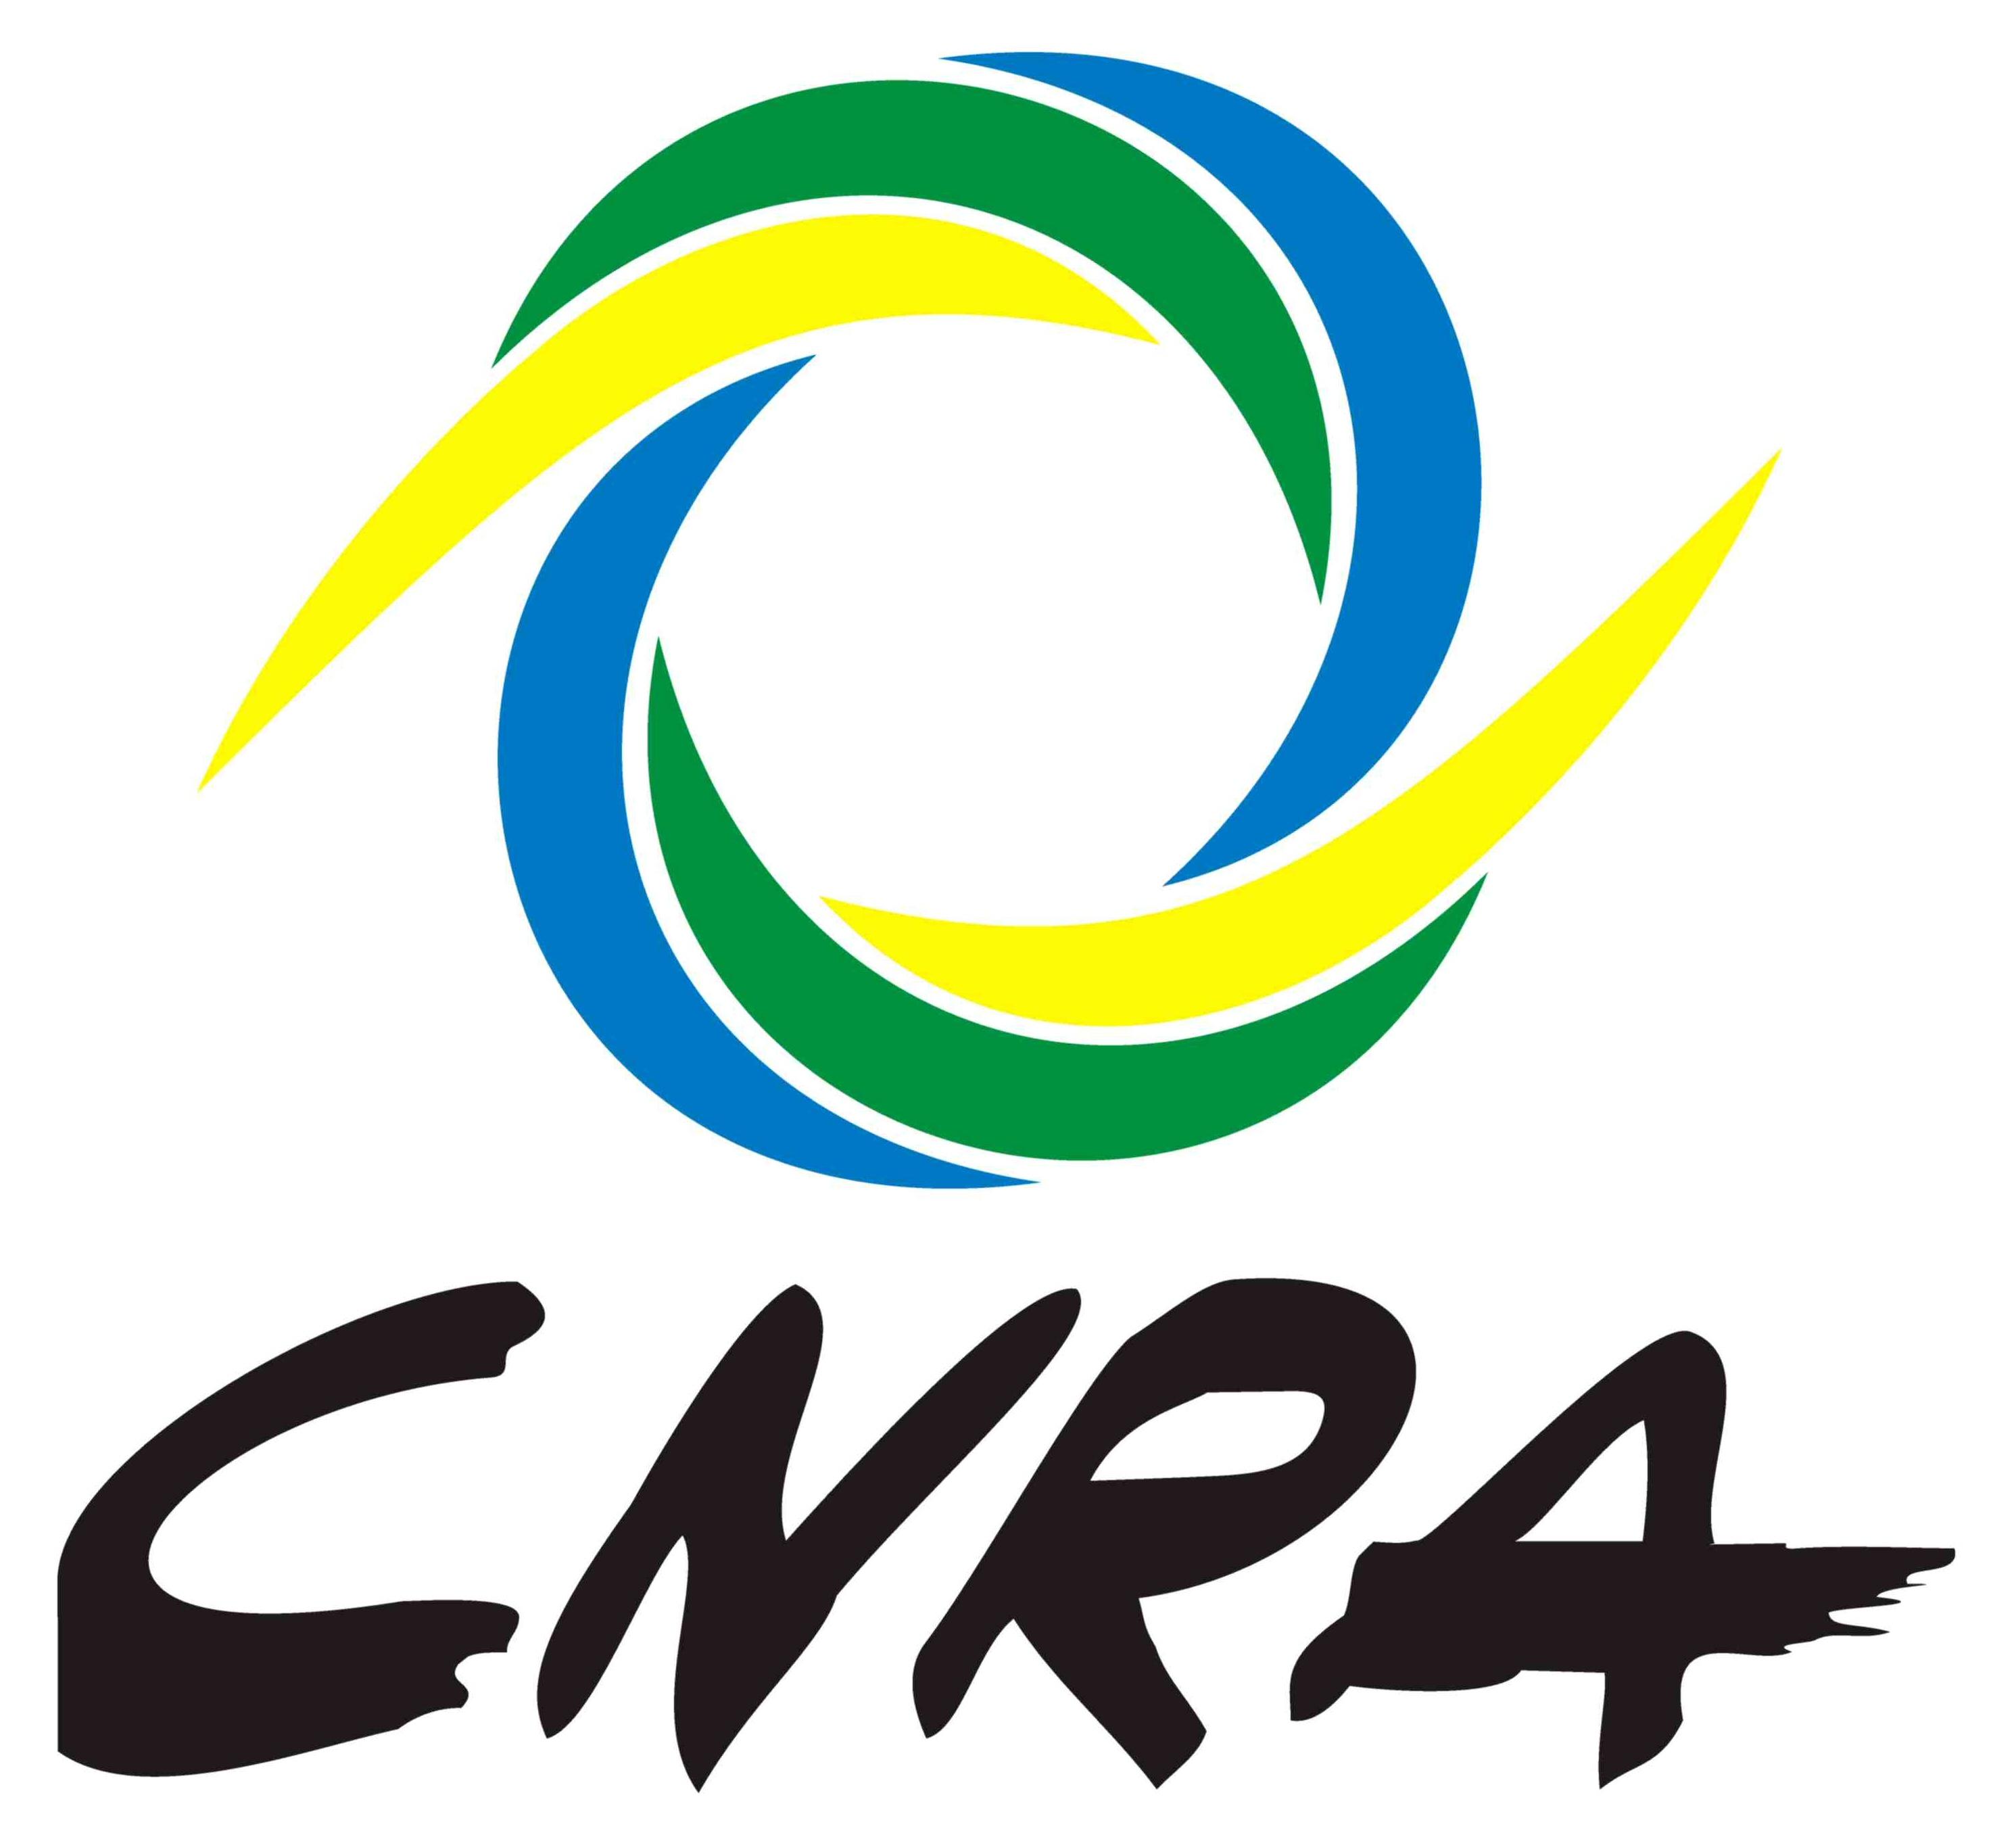 Edito : la CNRA a peur des nouvelles radios